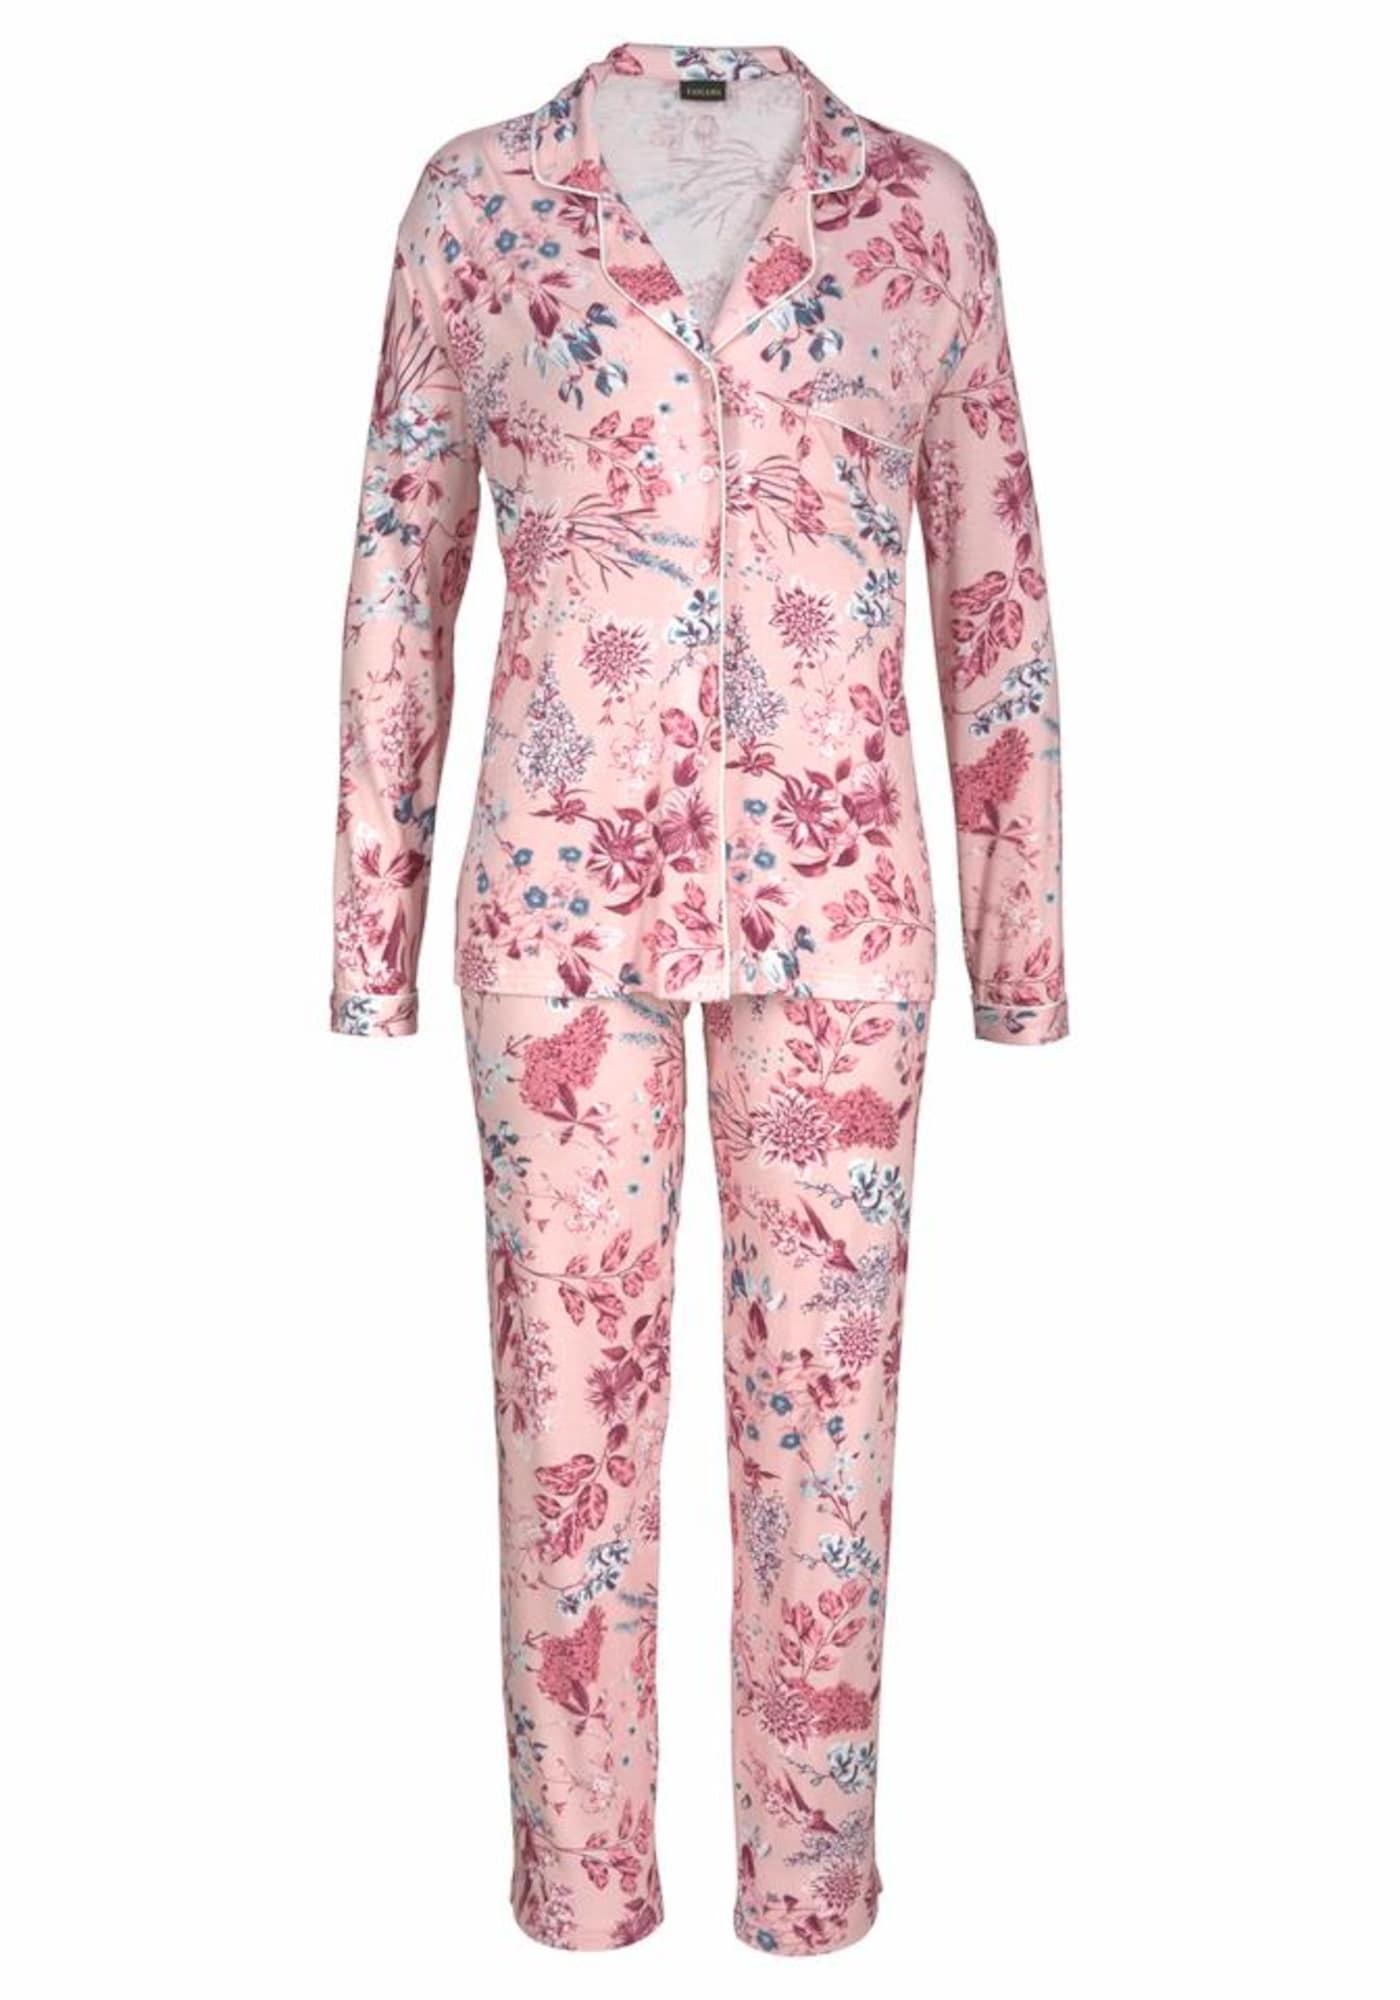 Bodywear Pyjama | Bekleidung > Nachtwäsche > Pyjamas | Rosa | S.Oliver